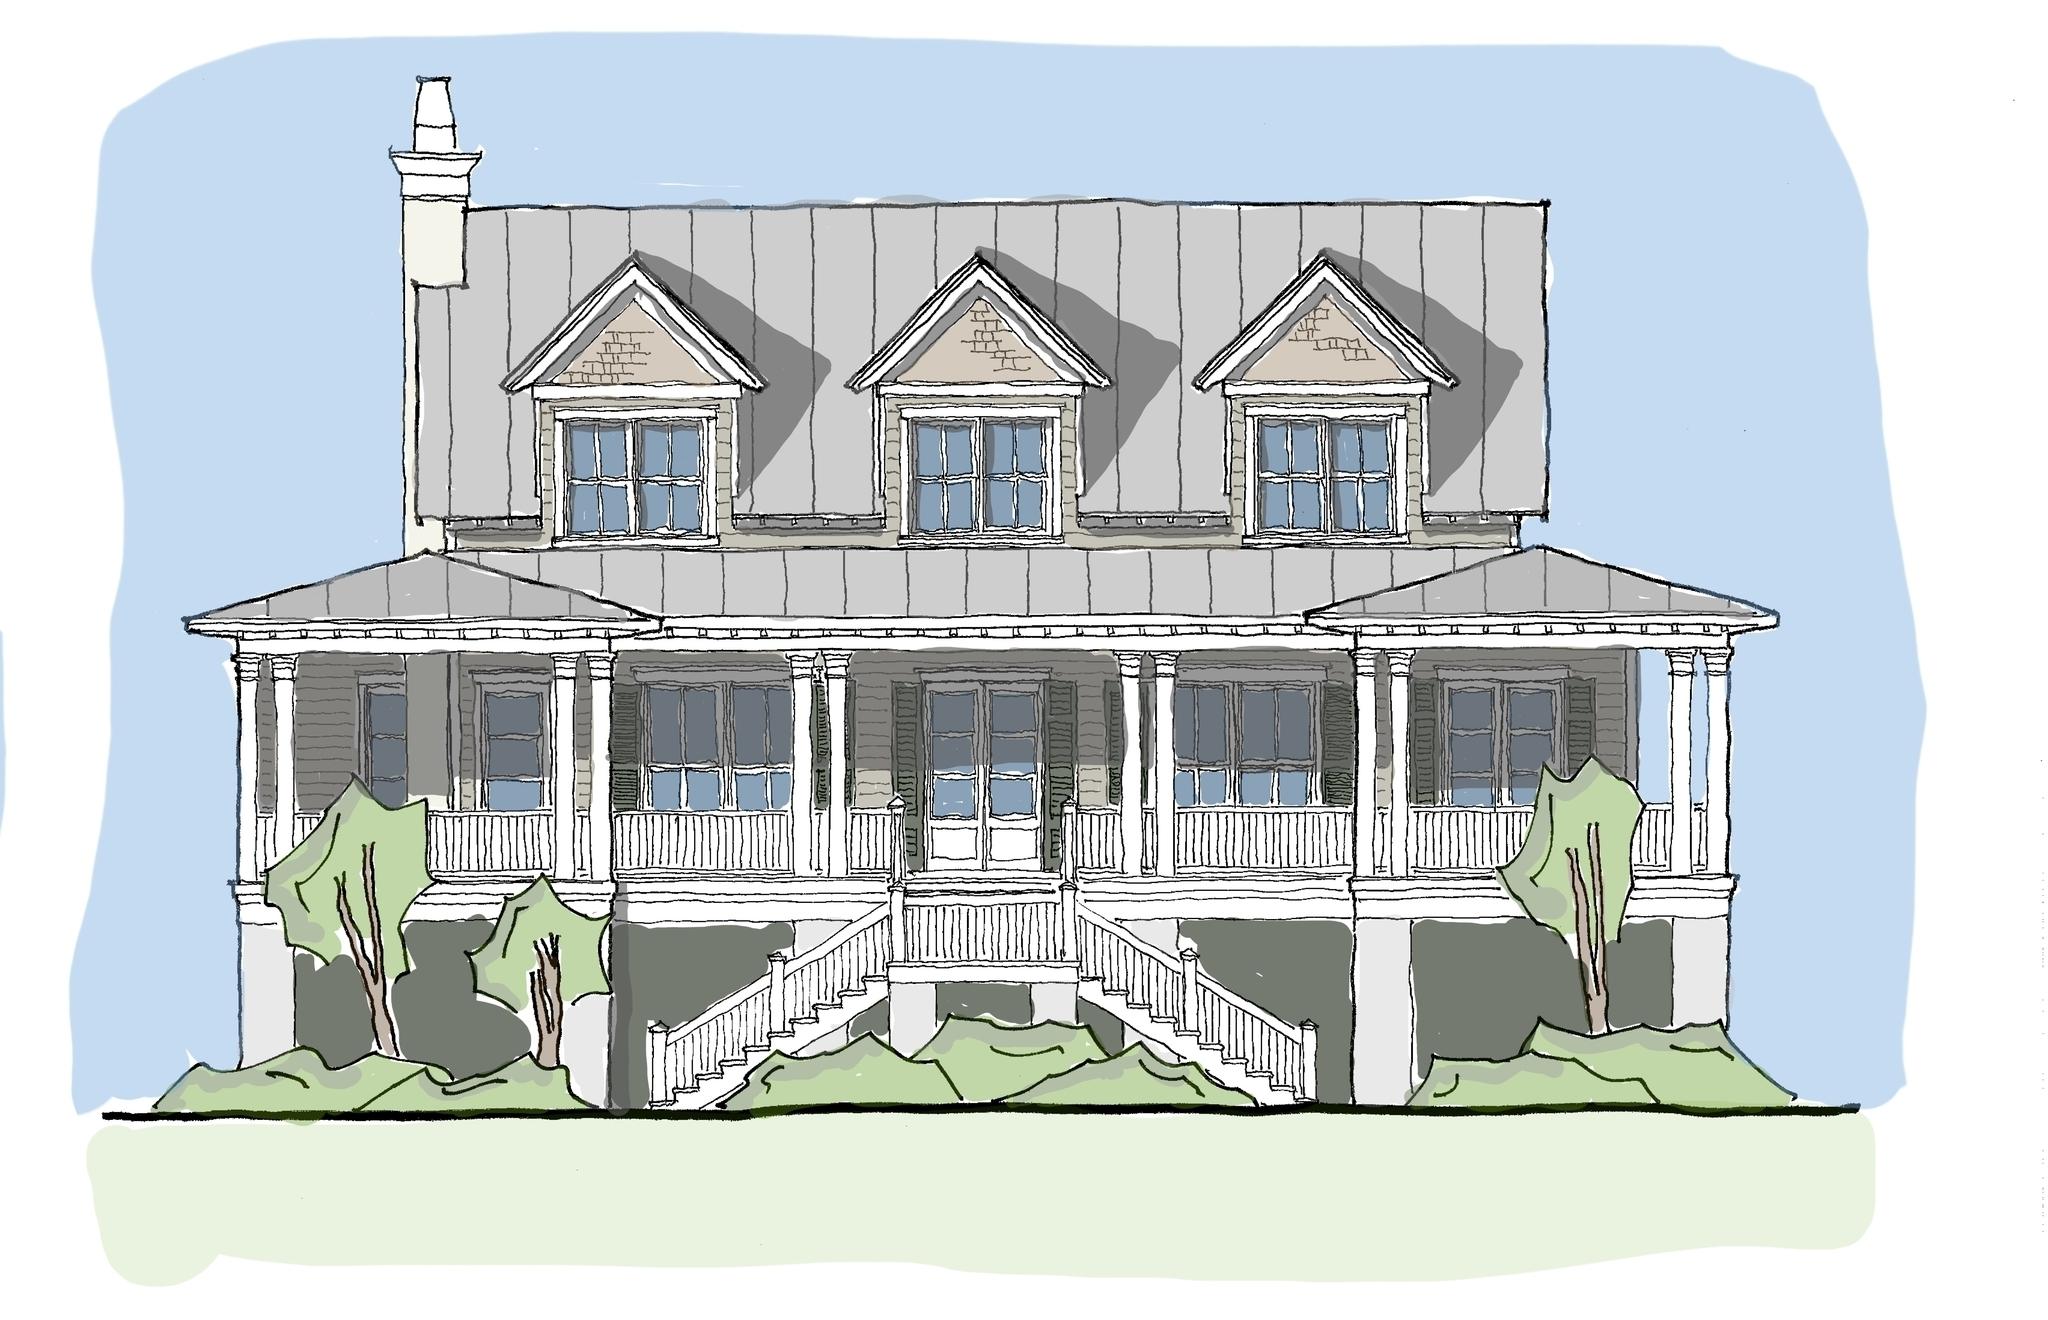 Carolina Kite   Flatfish Island Designs   Coastal Home Plans